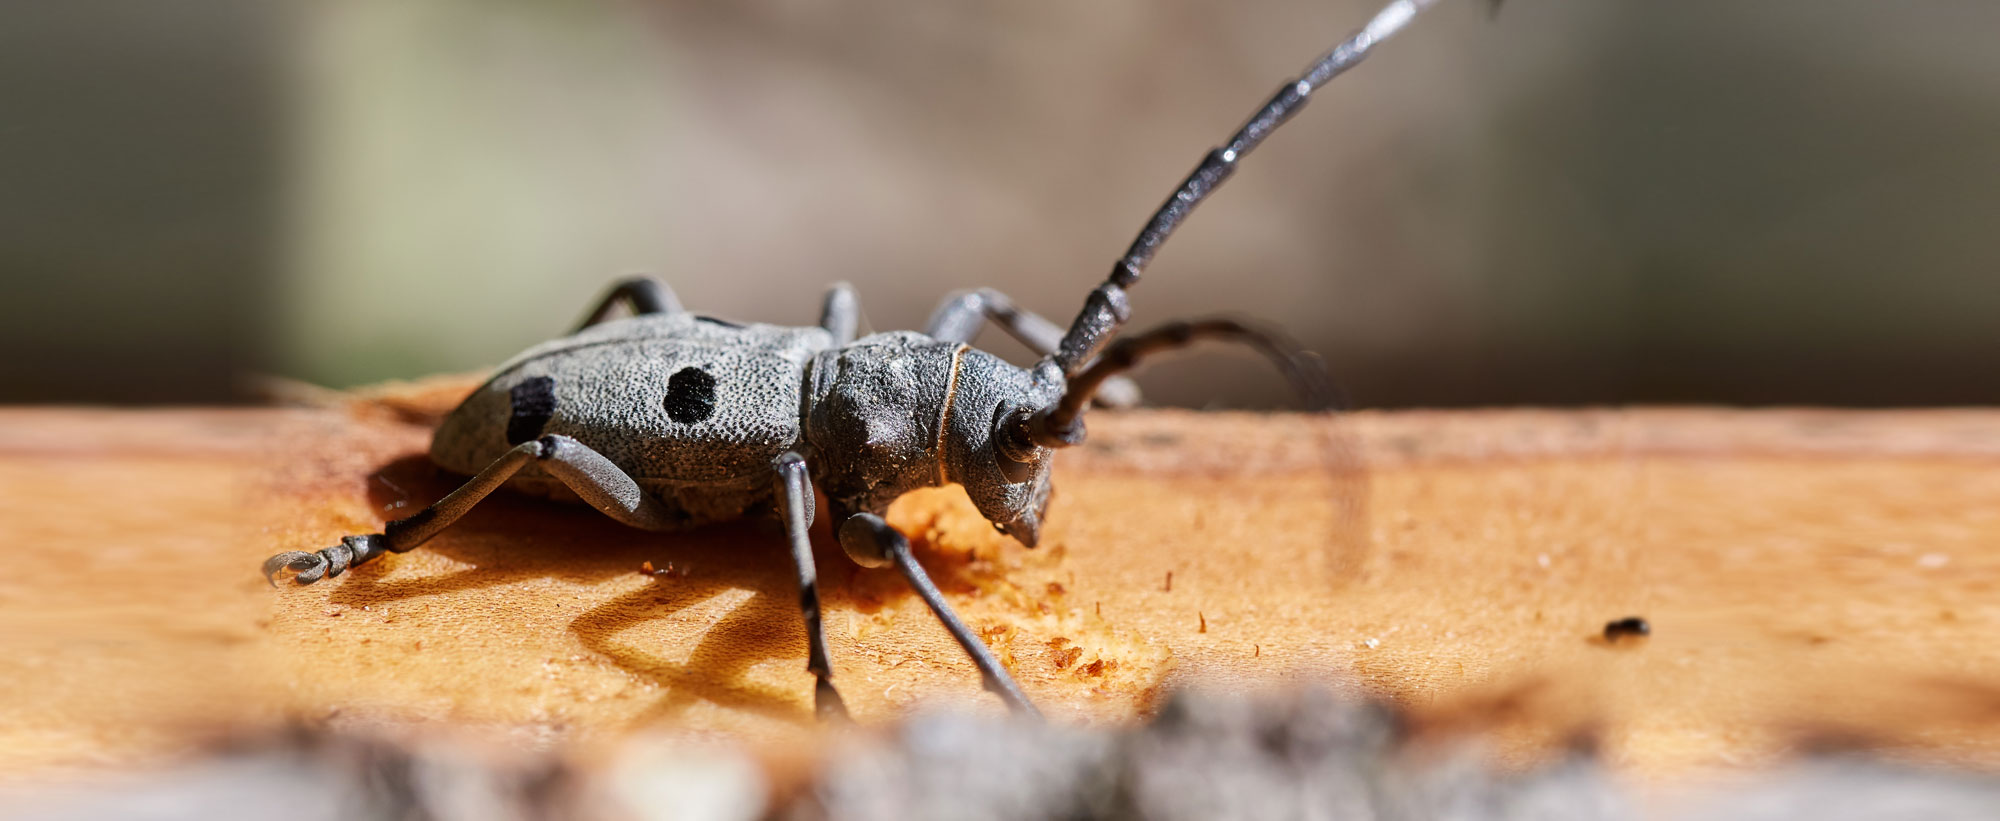 termite-fumigation-specialist-costa-blanca-termites-pest-control